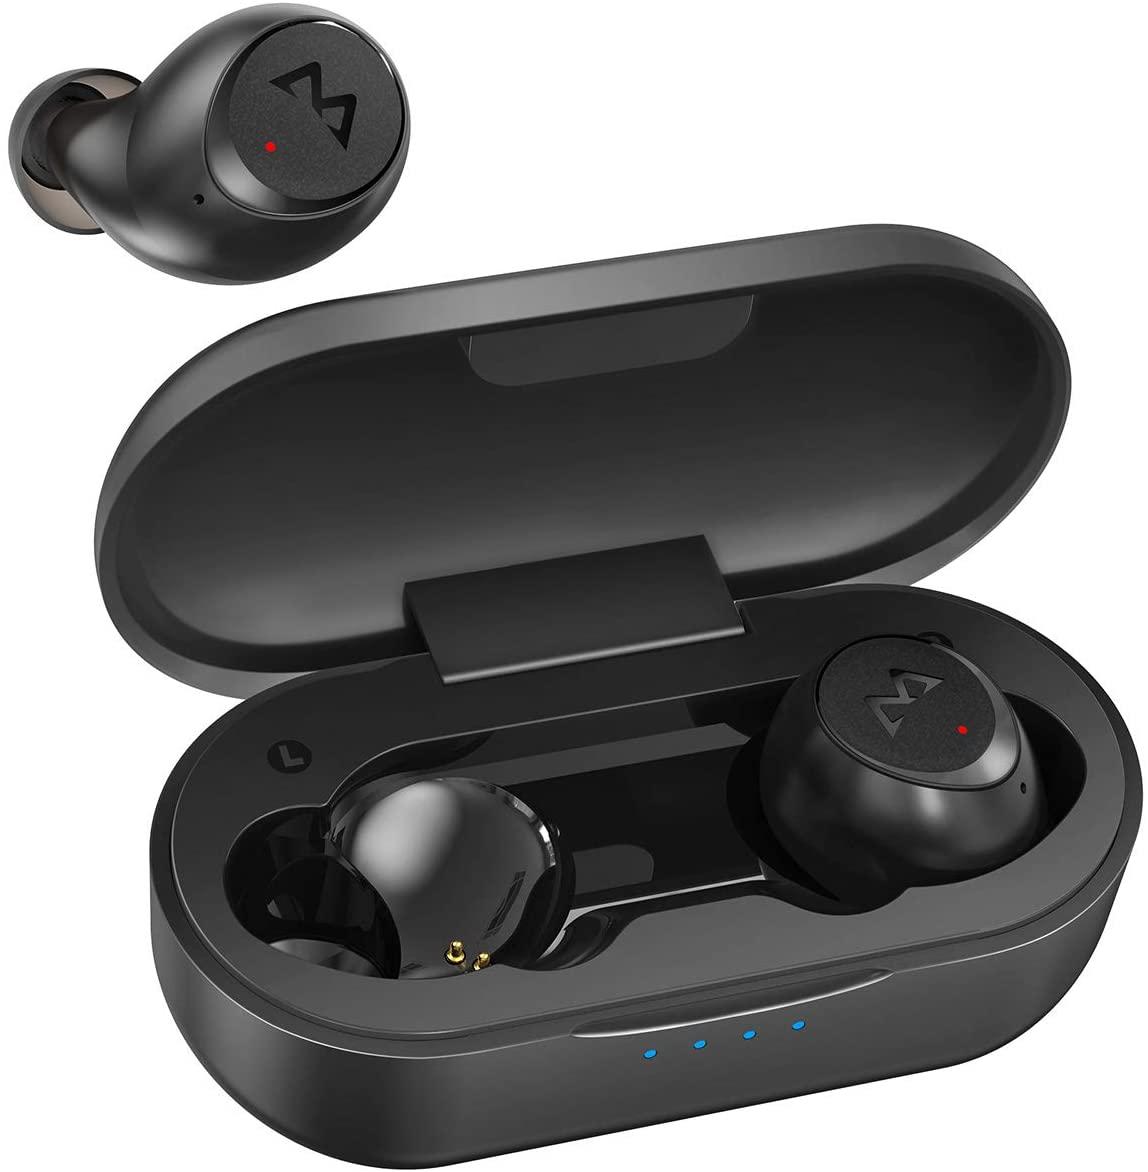 Wireless Earbuds, Mpow M7 Bluetooth Sports Earbuds w/Twin&Mono Mode, Deep Bass Bluetooth Earbuds Wireless w/30 Hrs/Noise Cancelling Mics/USB C Quick Charging/Ergonomic Design, Black